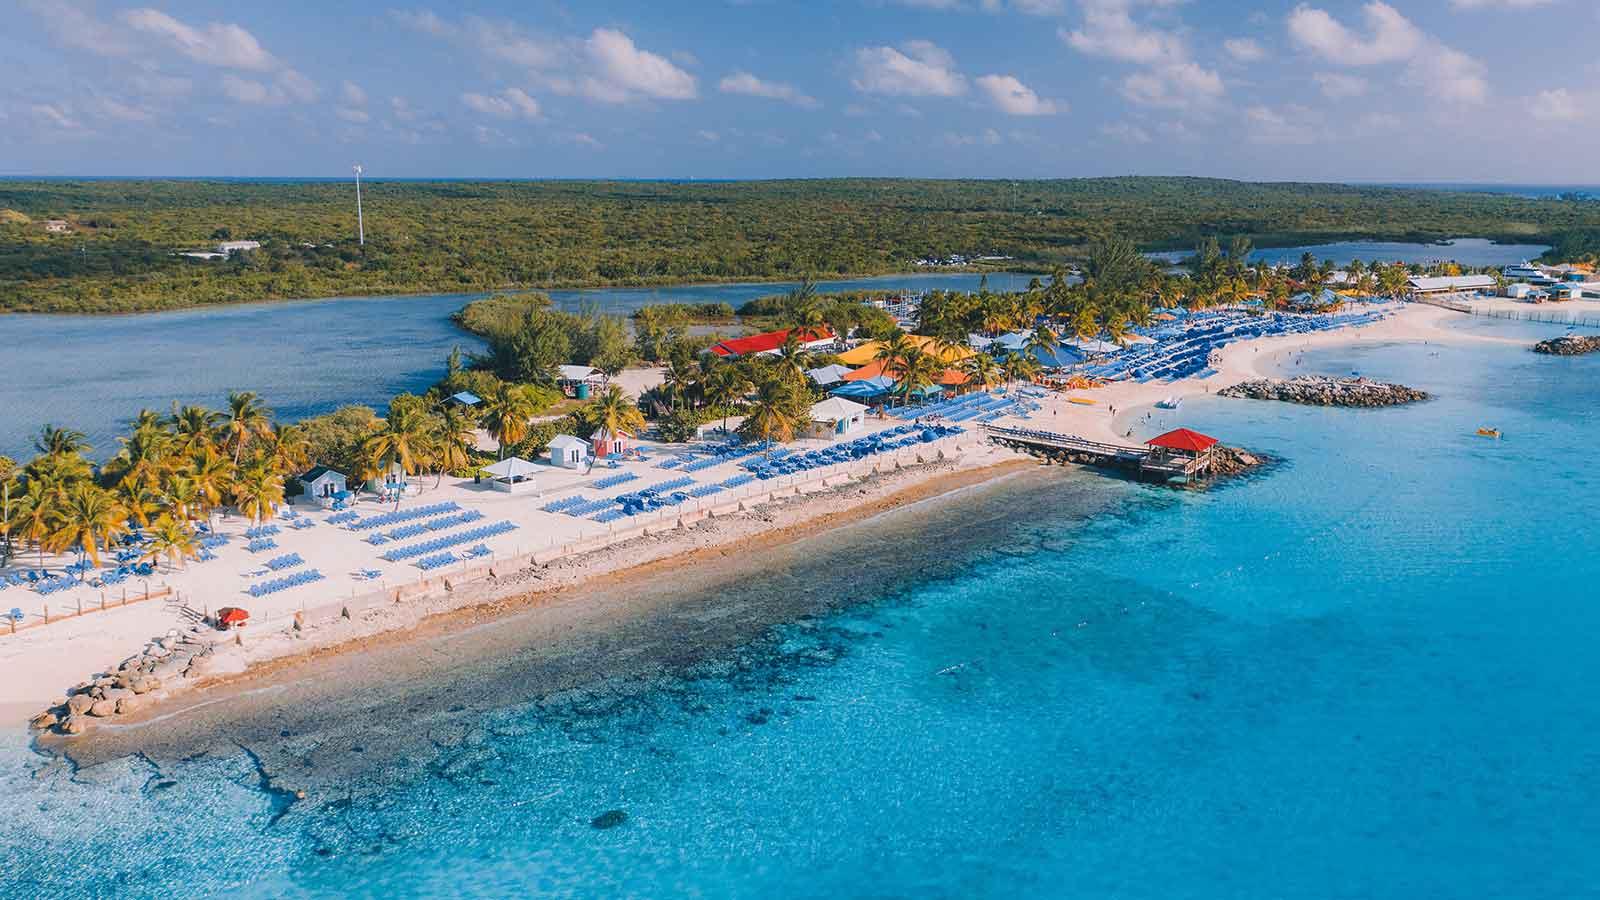 Princess Cays, Princess' Private Island Resort in the Bahamas